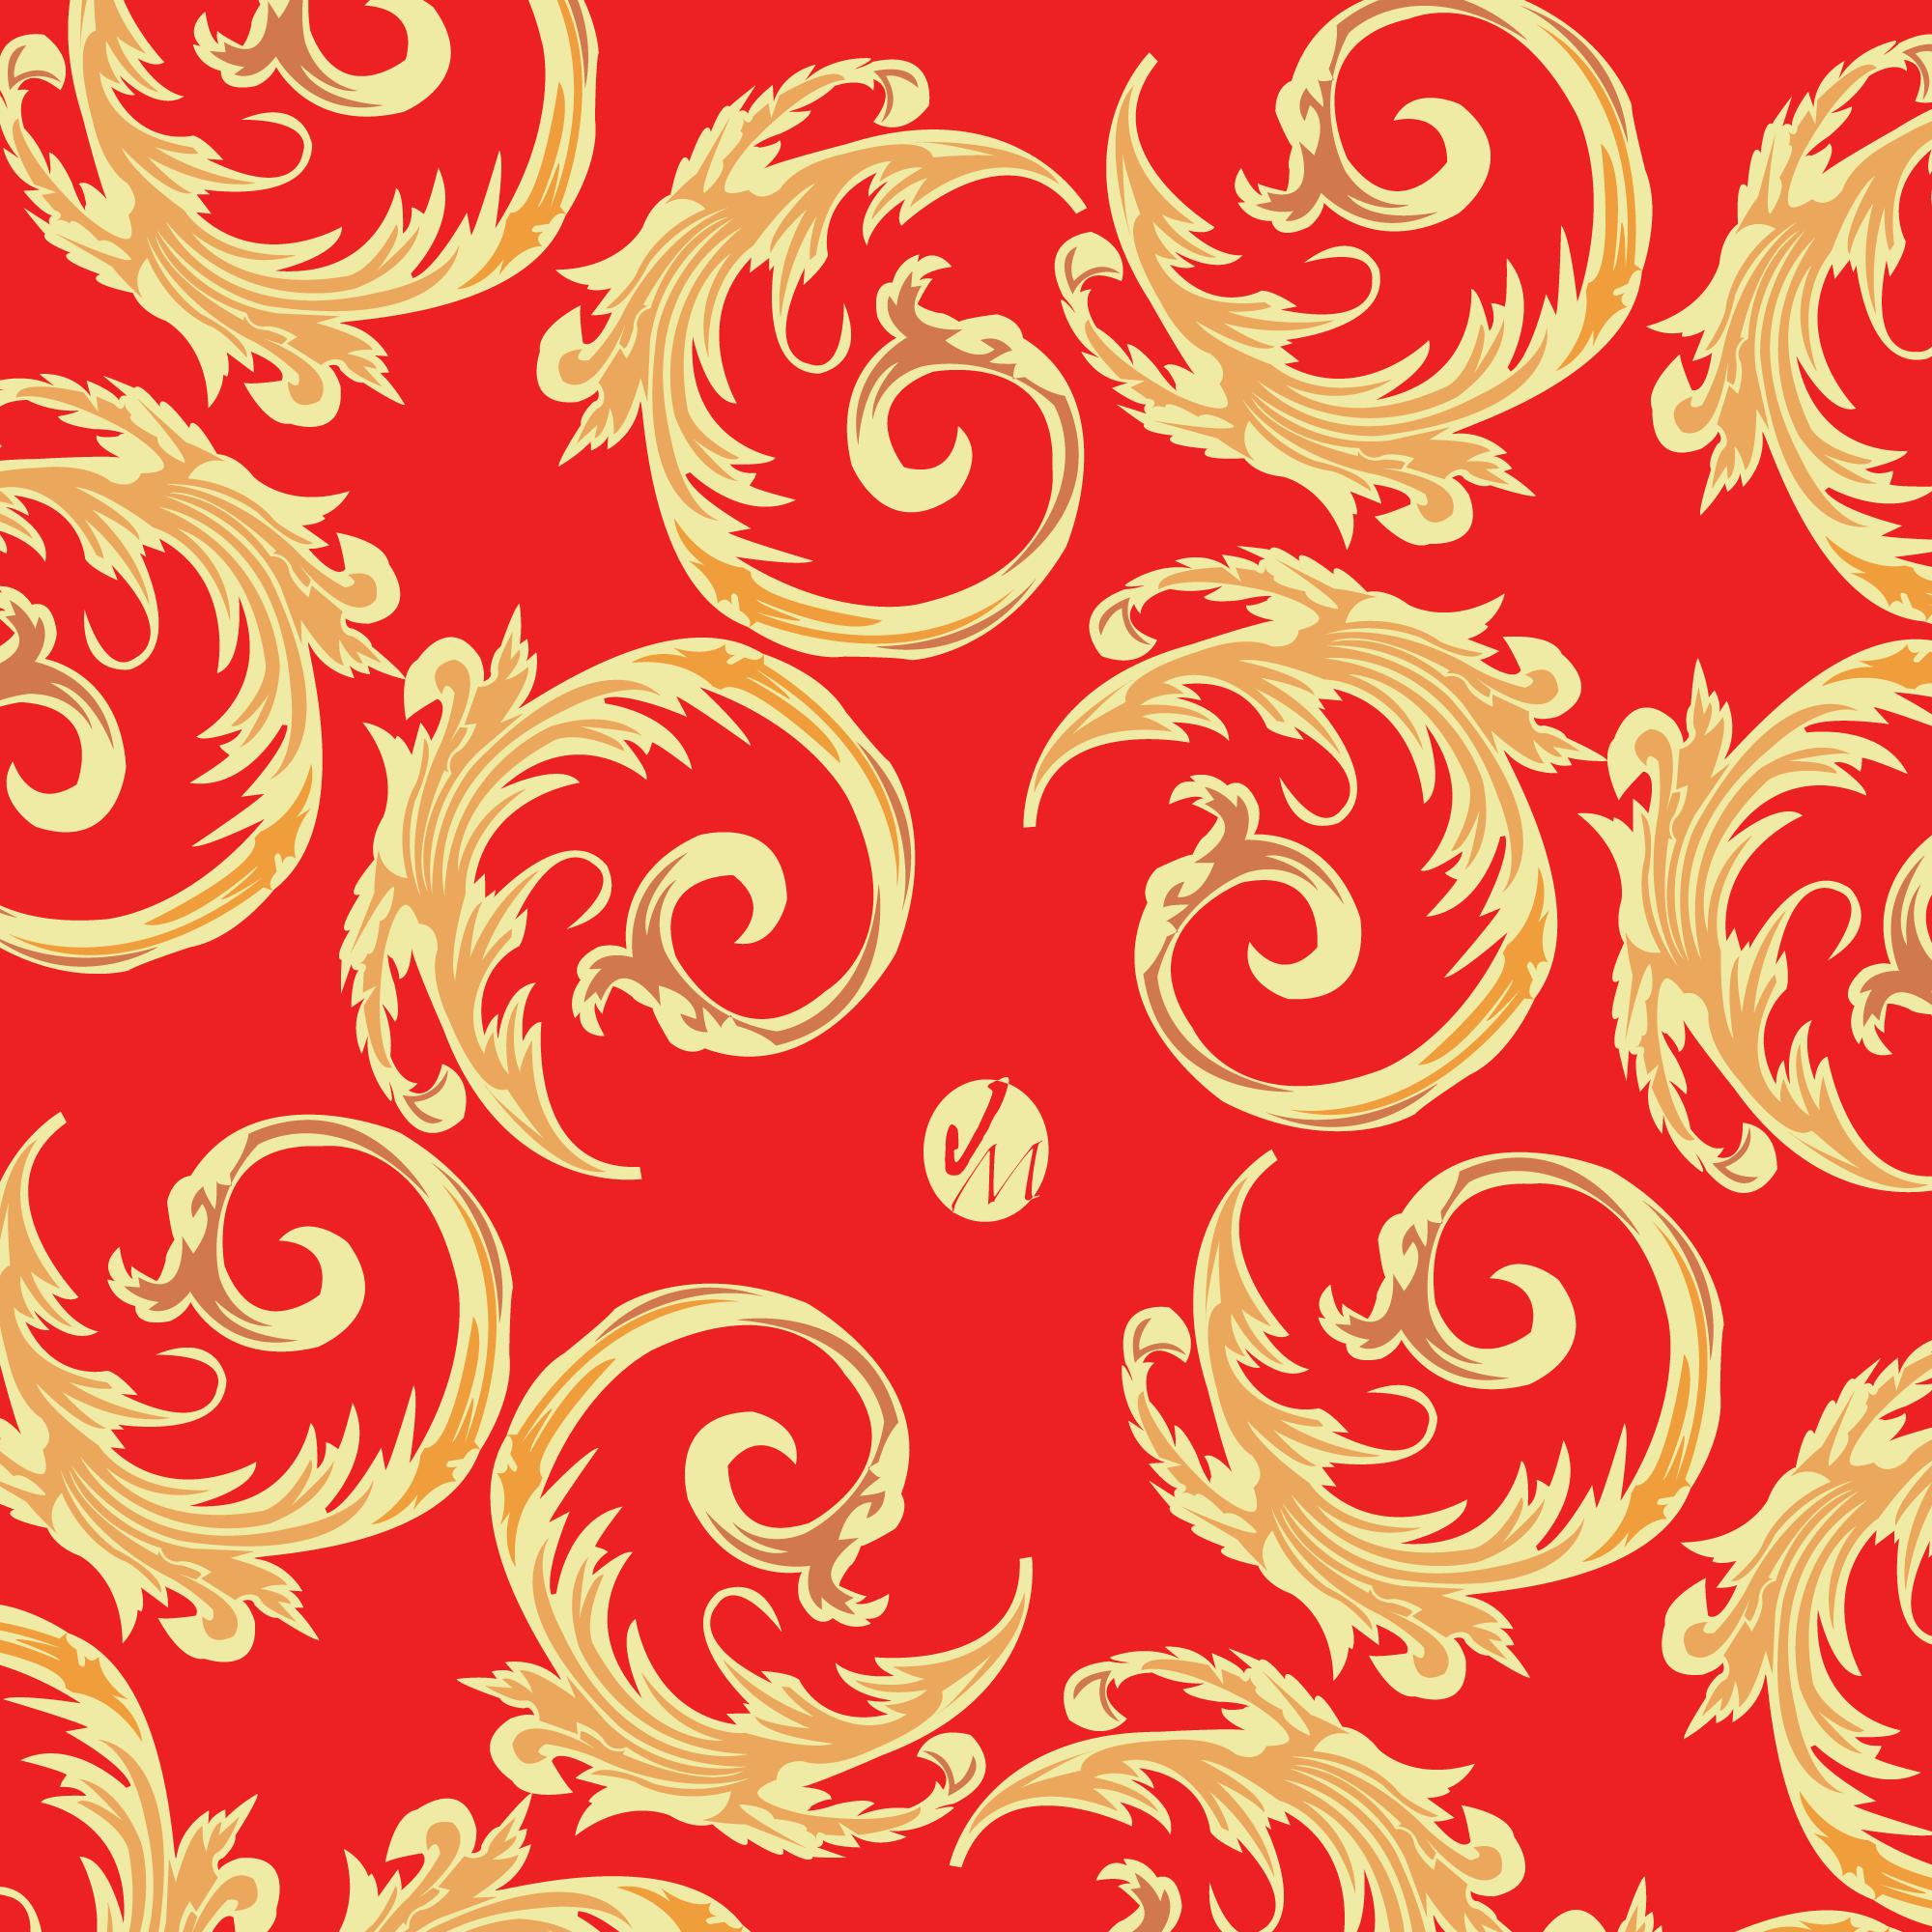 Supreme-Print-Red.png